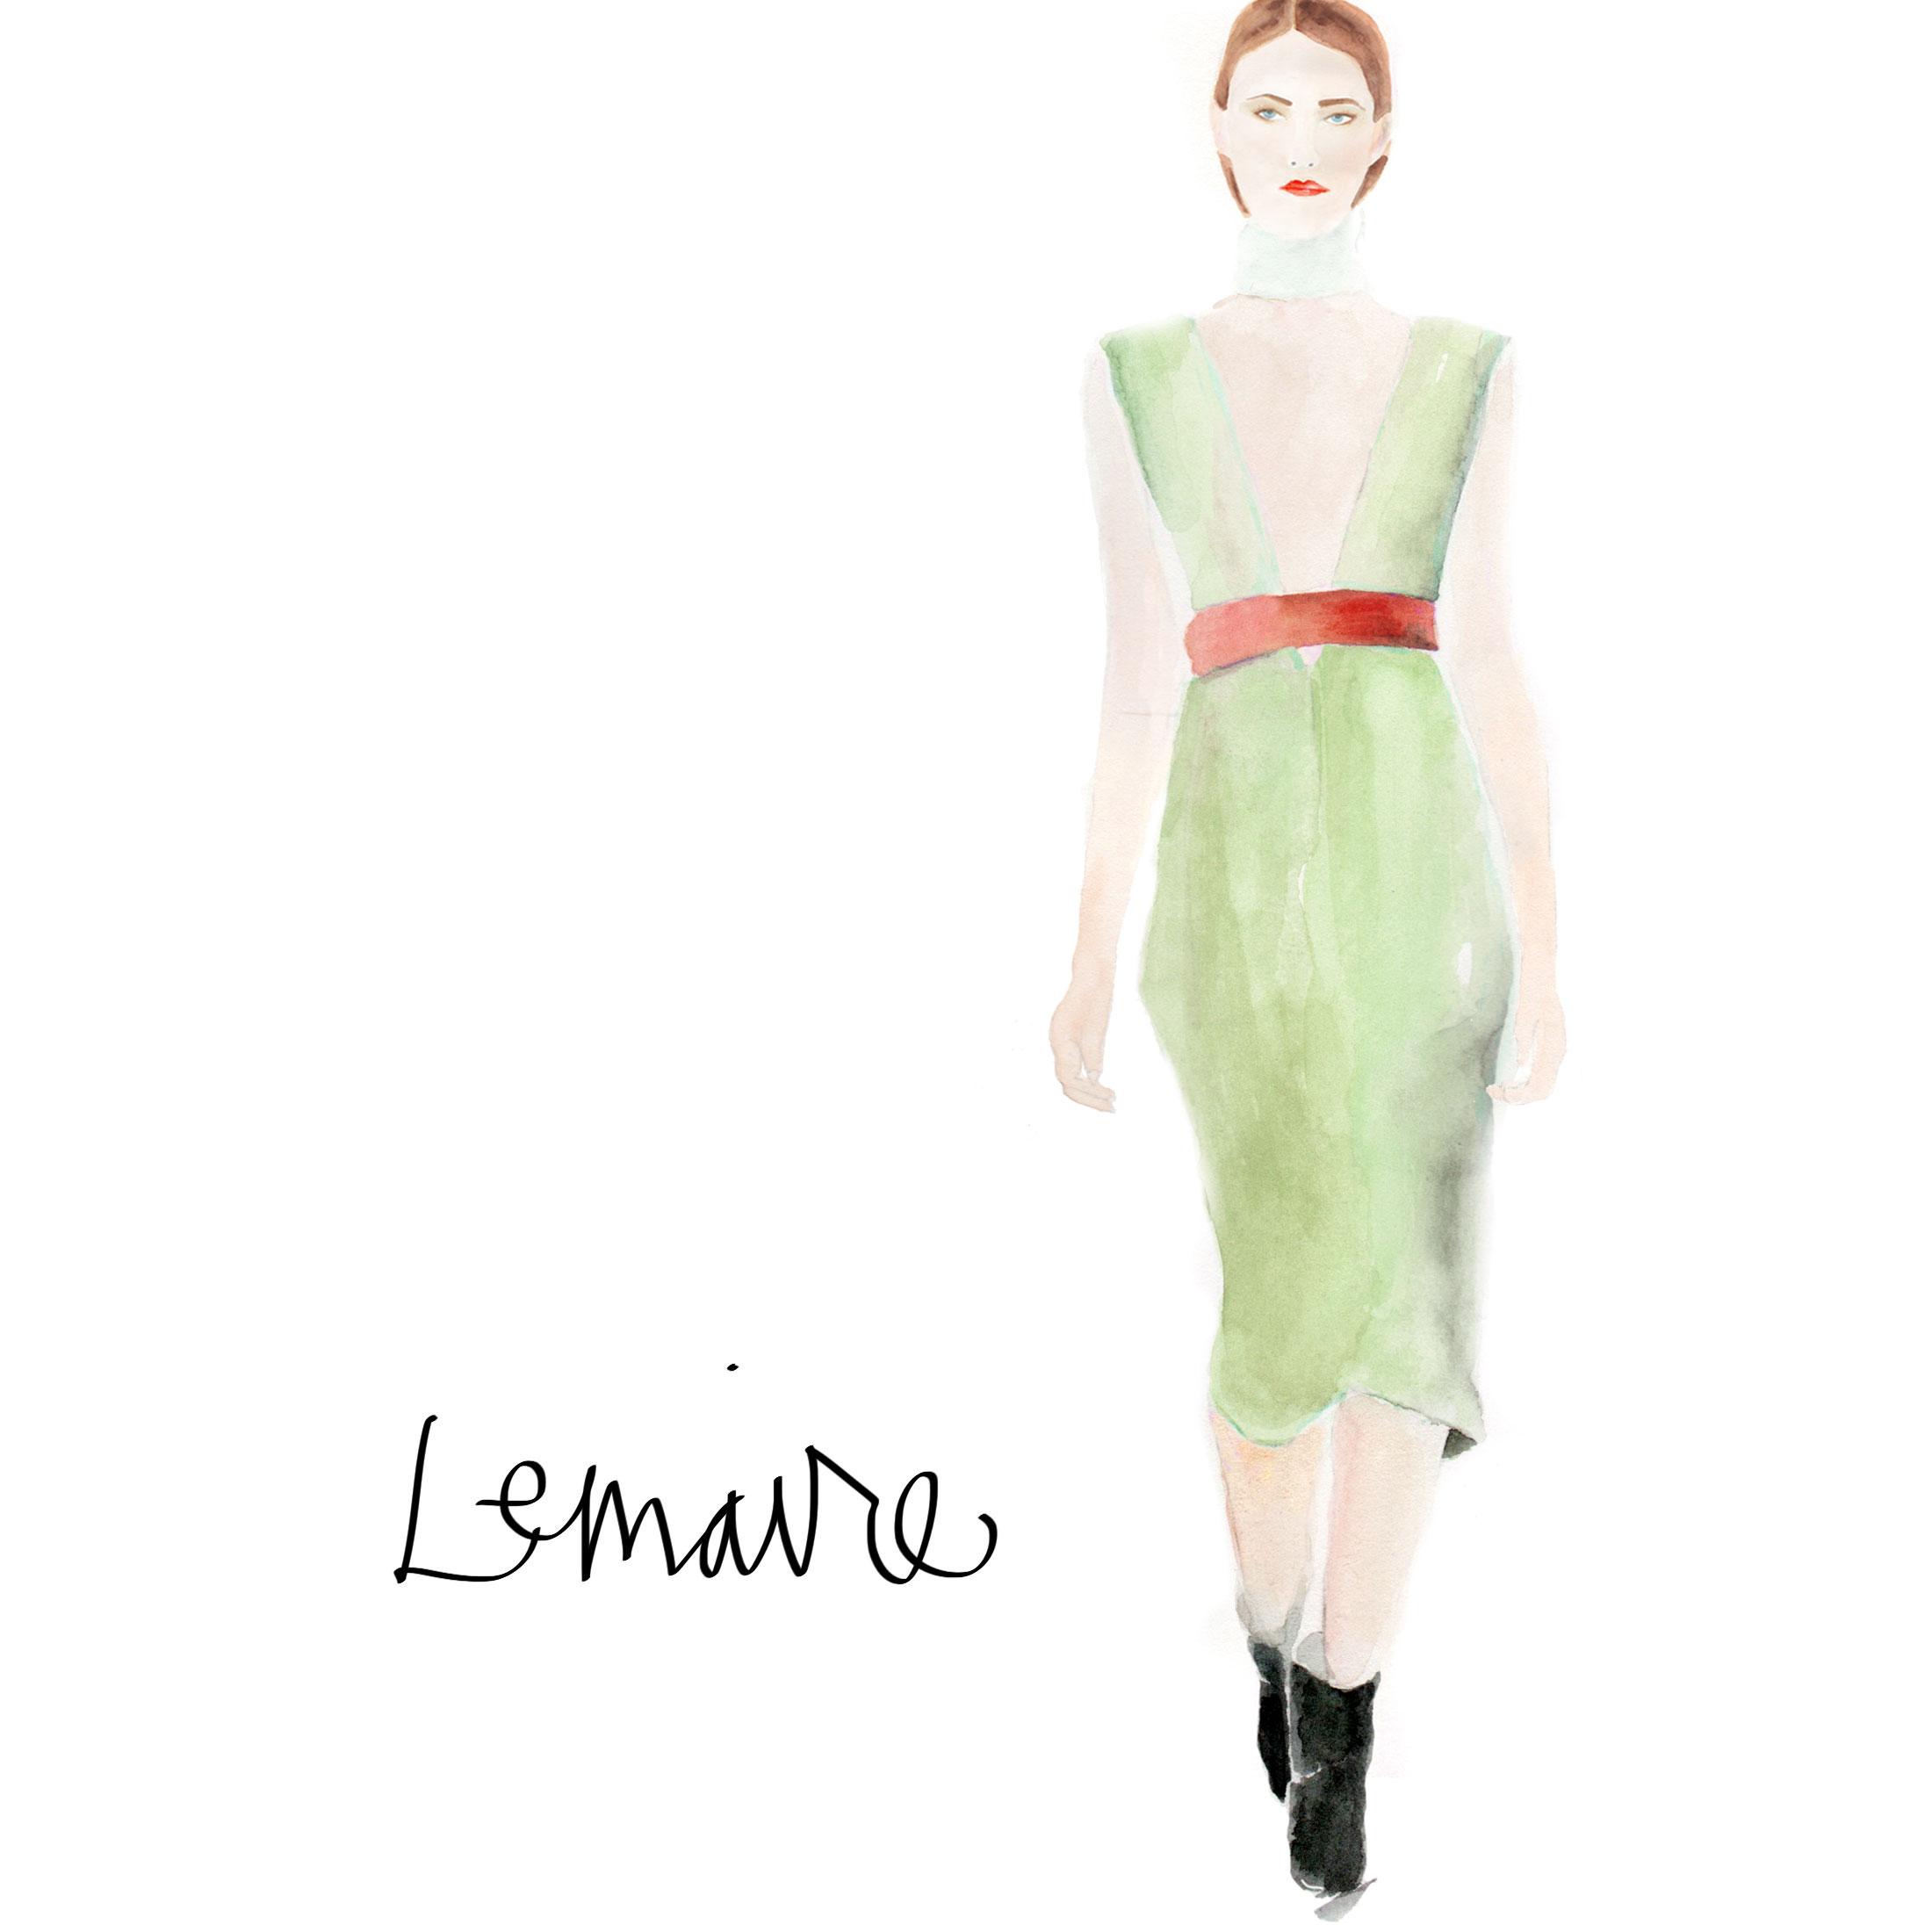 Lemaire dress illustration by Naomi Yamada